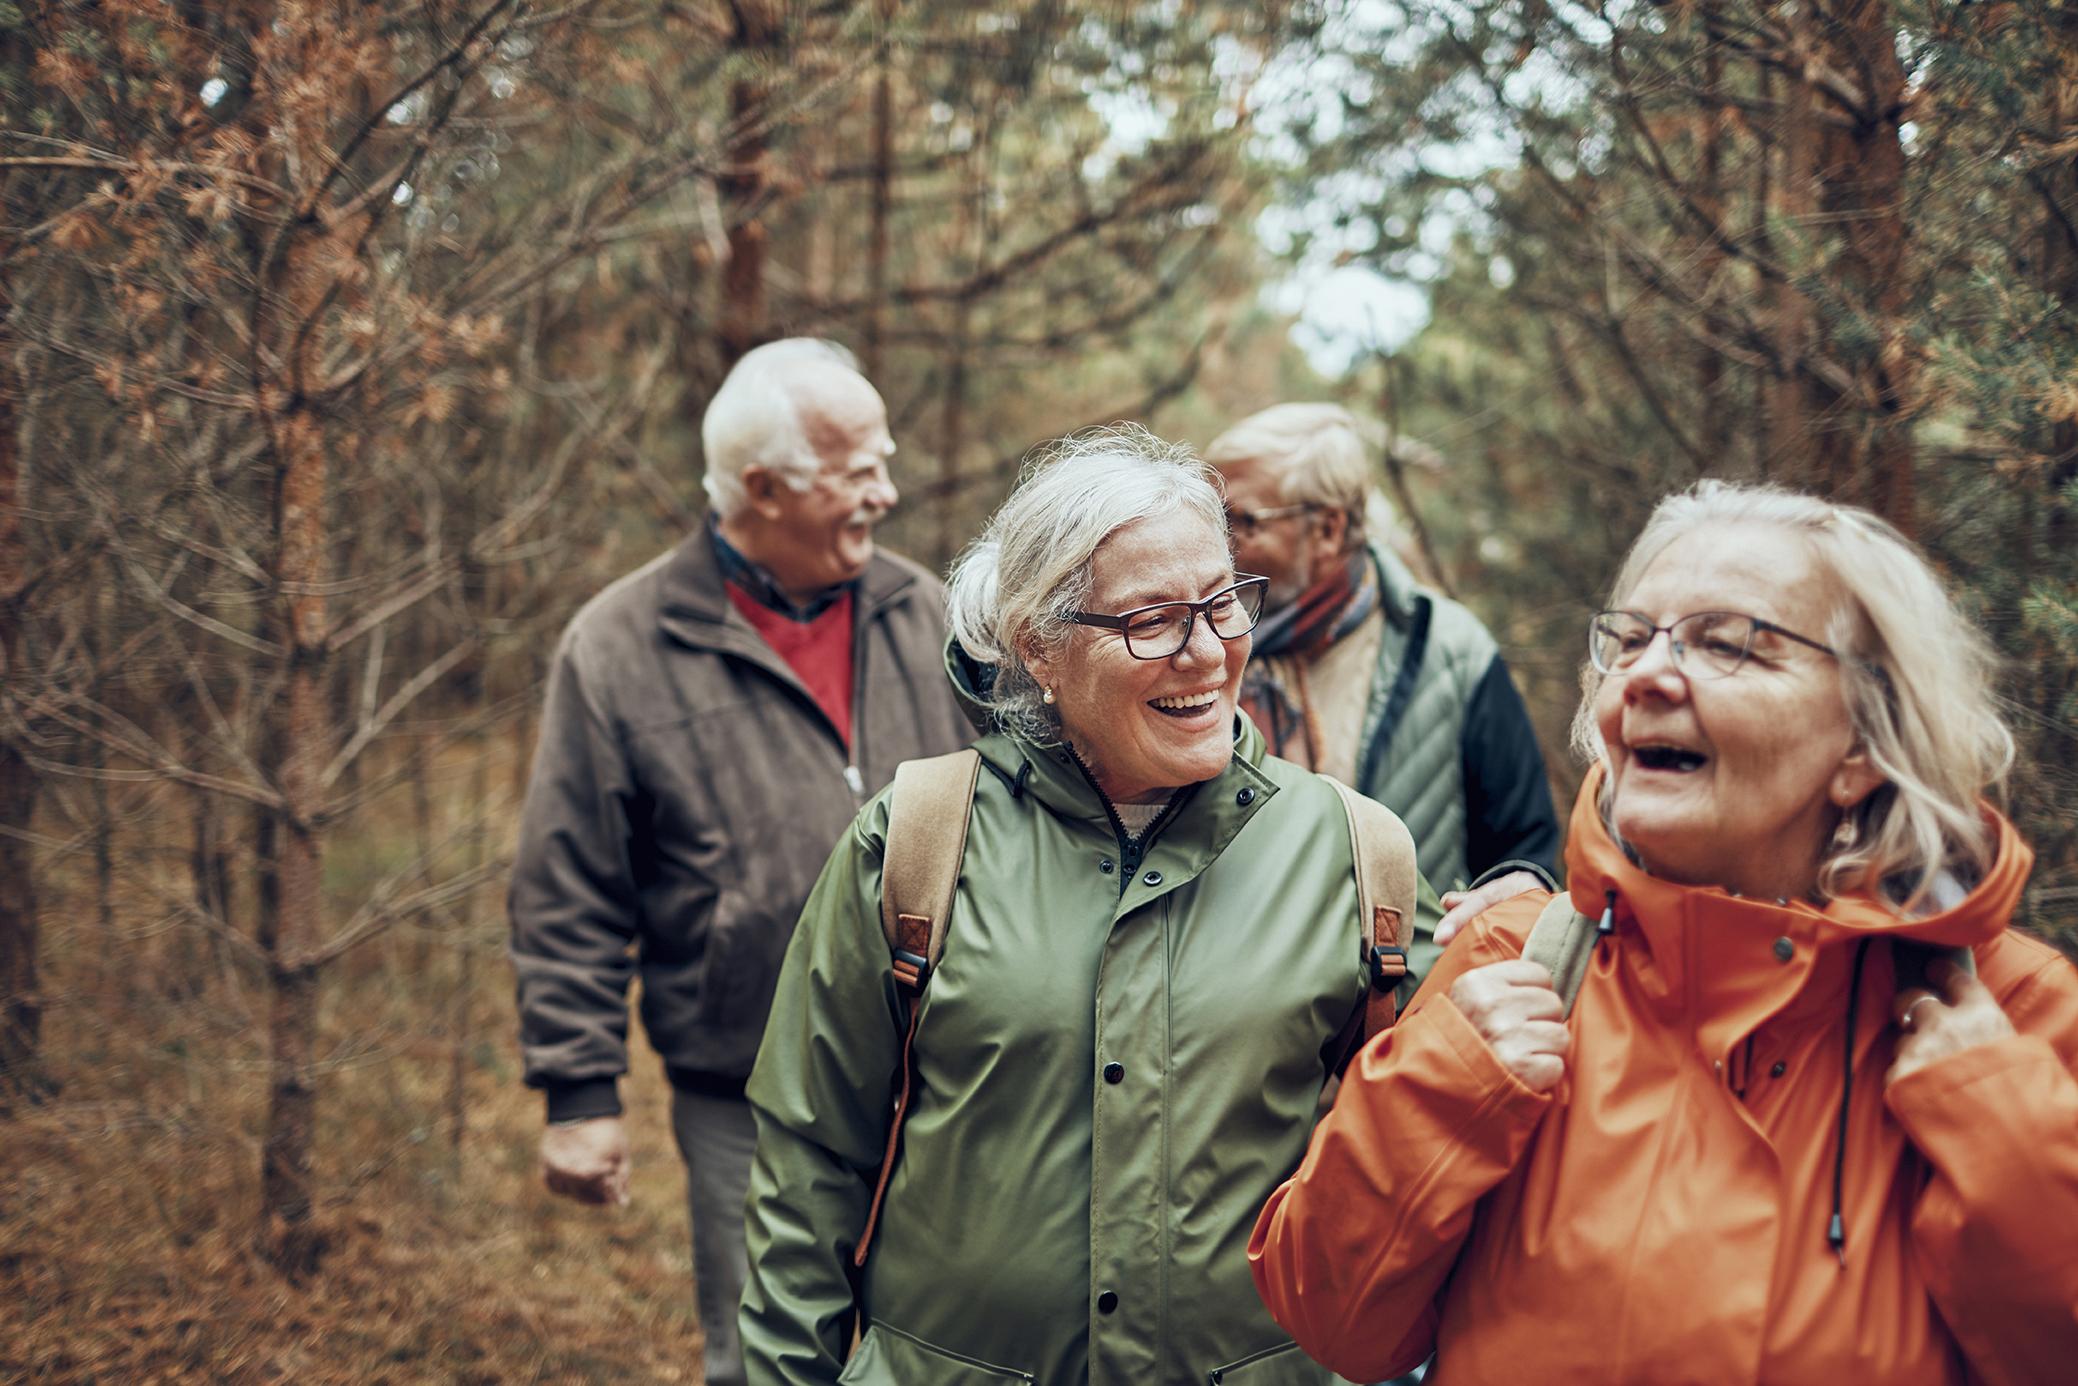 Seniors hiking through the foerst